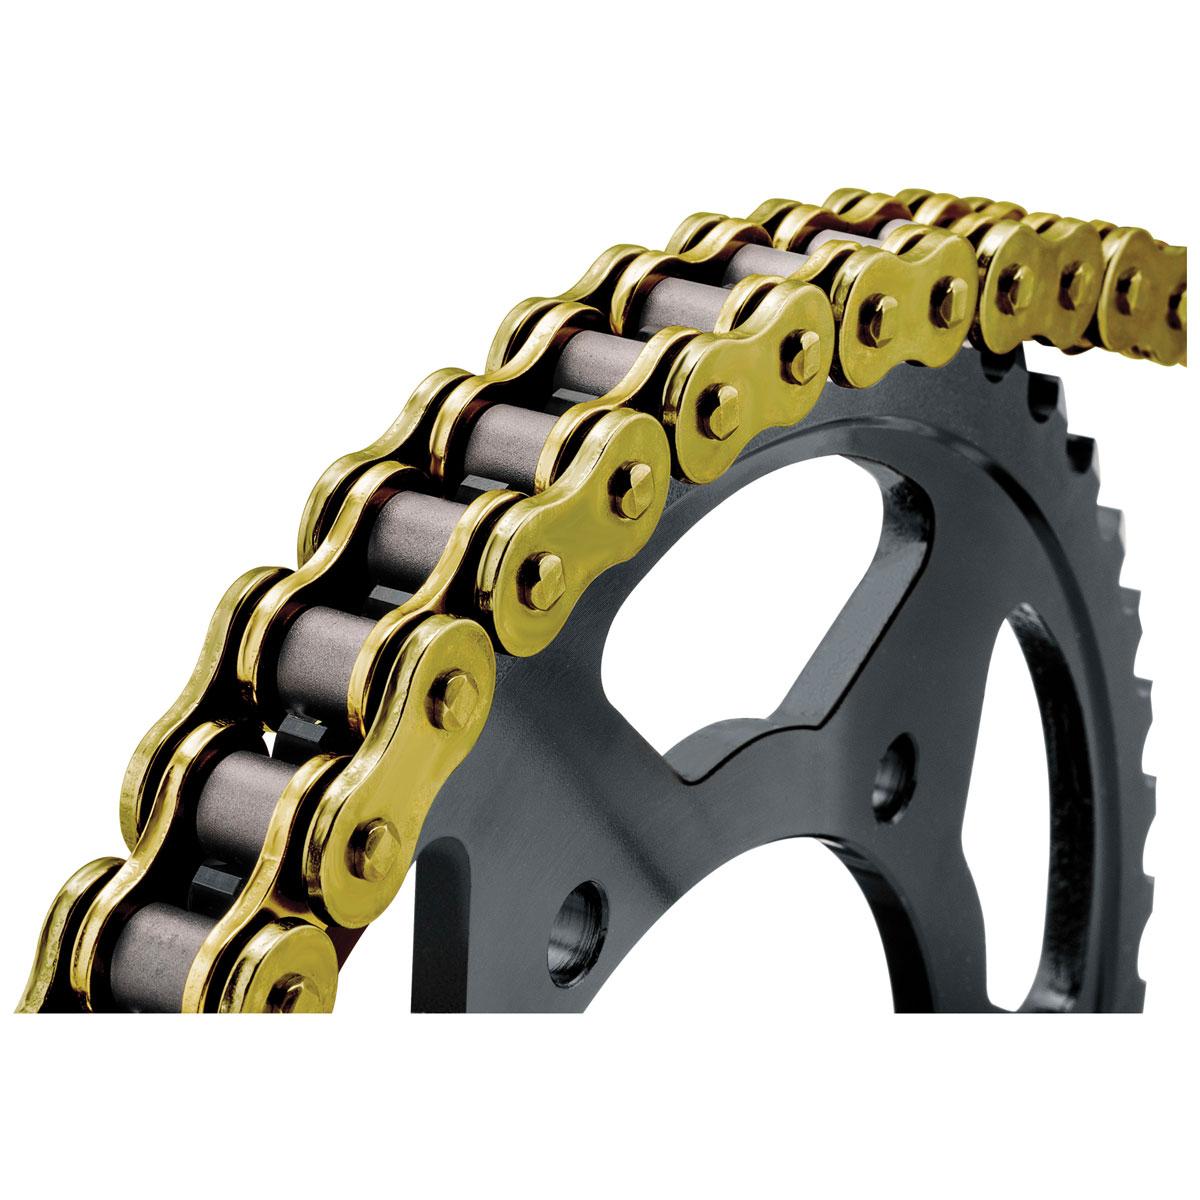 BikeMaster 520 HD Precision Roller Chain Gold